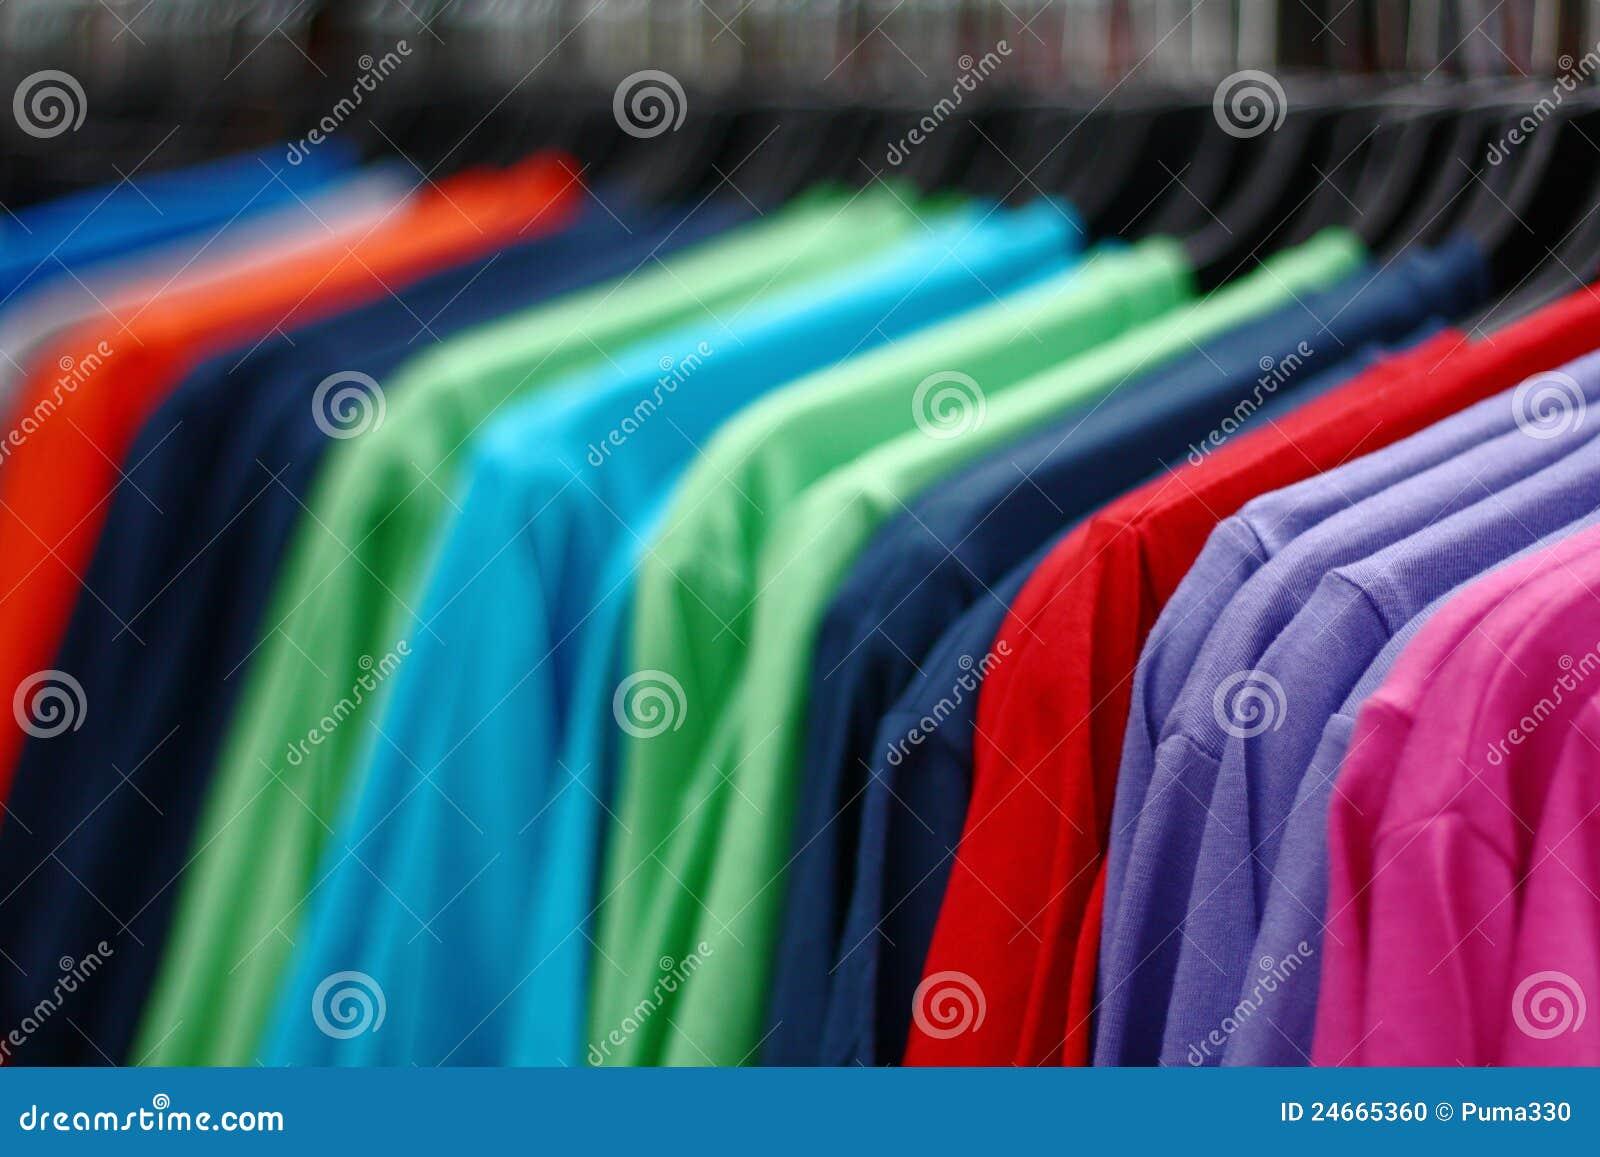 bd6504a35cef μπλούζες αγορών στοκ εικόνες. εικόνα από ανασκόπησης - 24665360